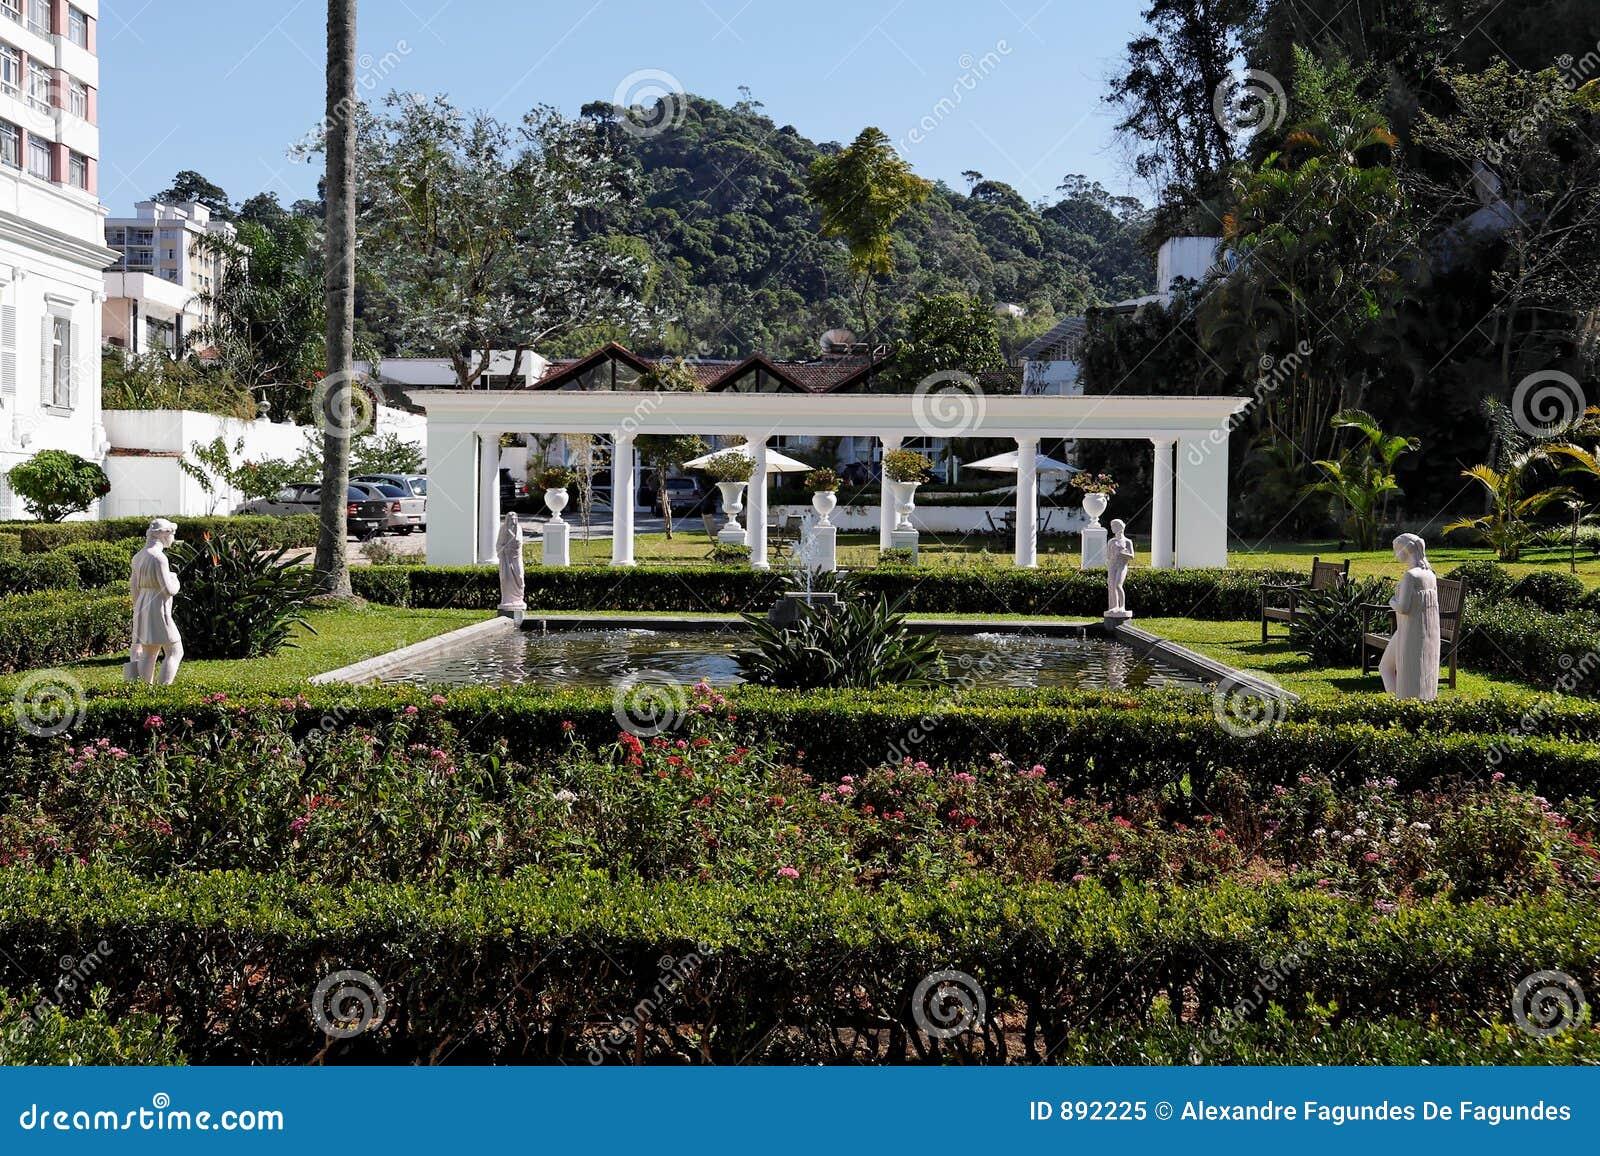 Petropolis ogrodowe rzeźby